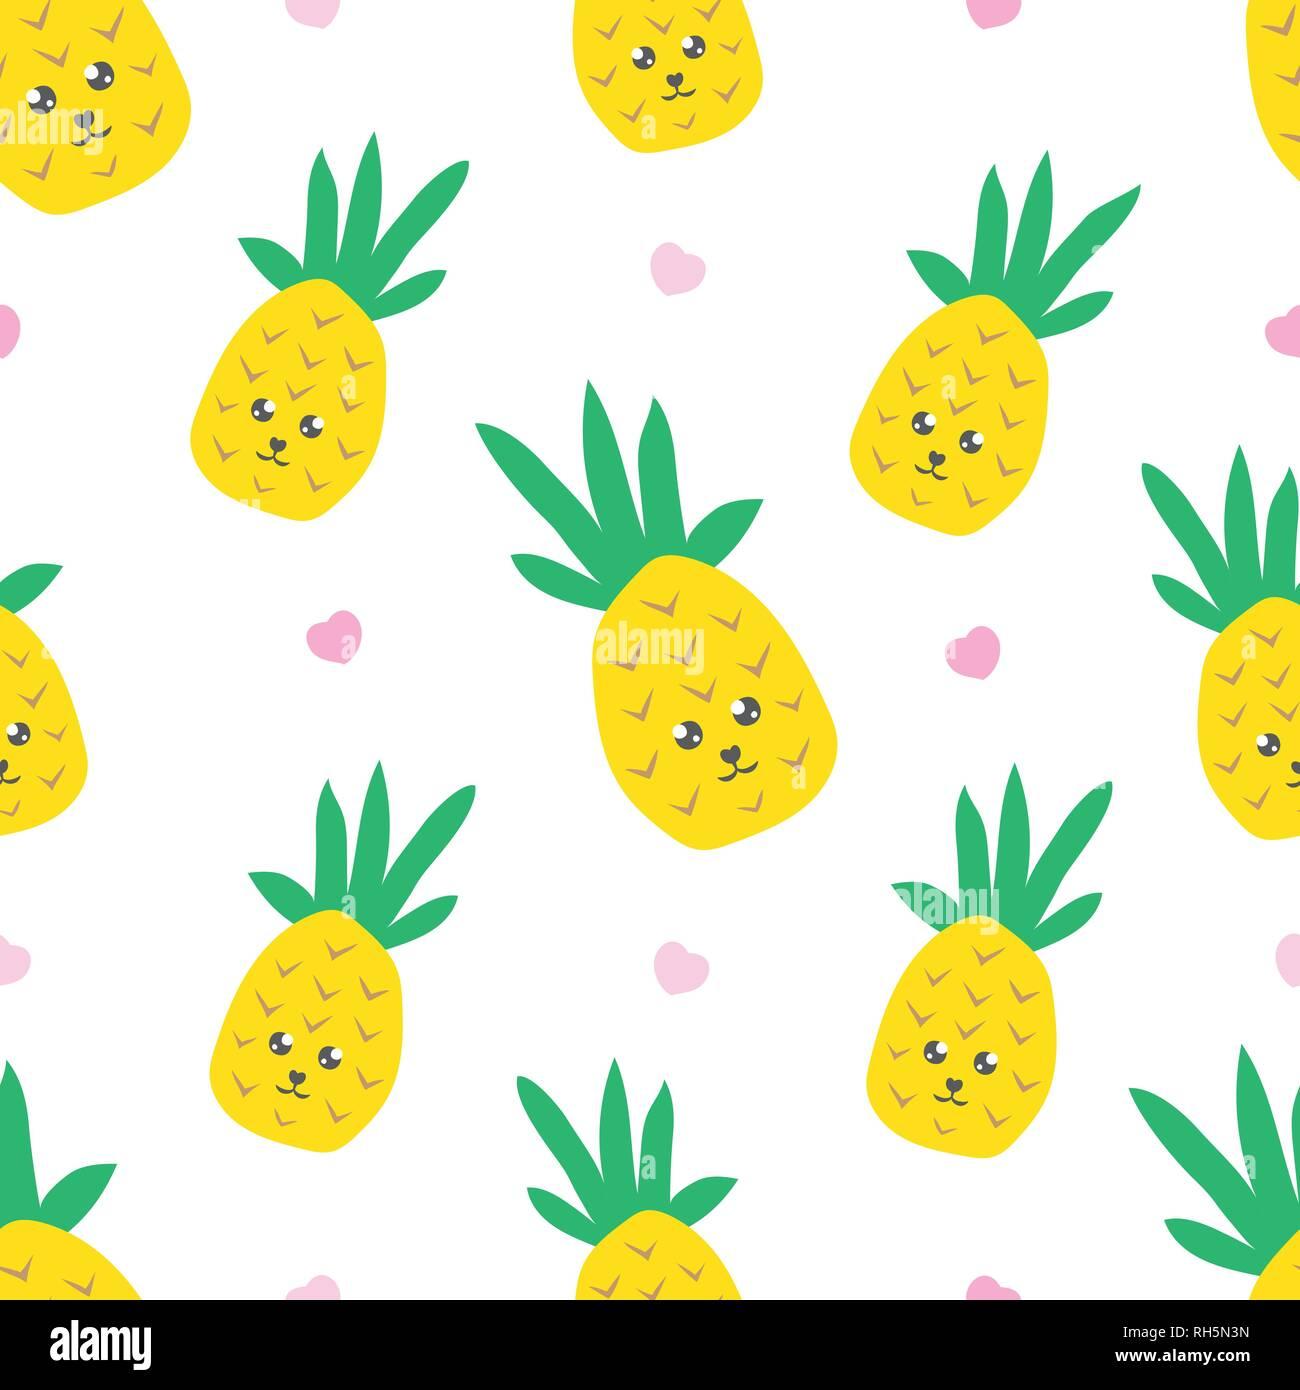 Infantile Seamless Pattern Con Cute Kawaii Ananas Texture Creative